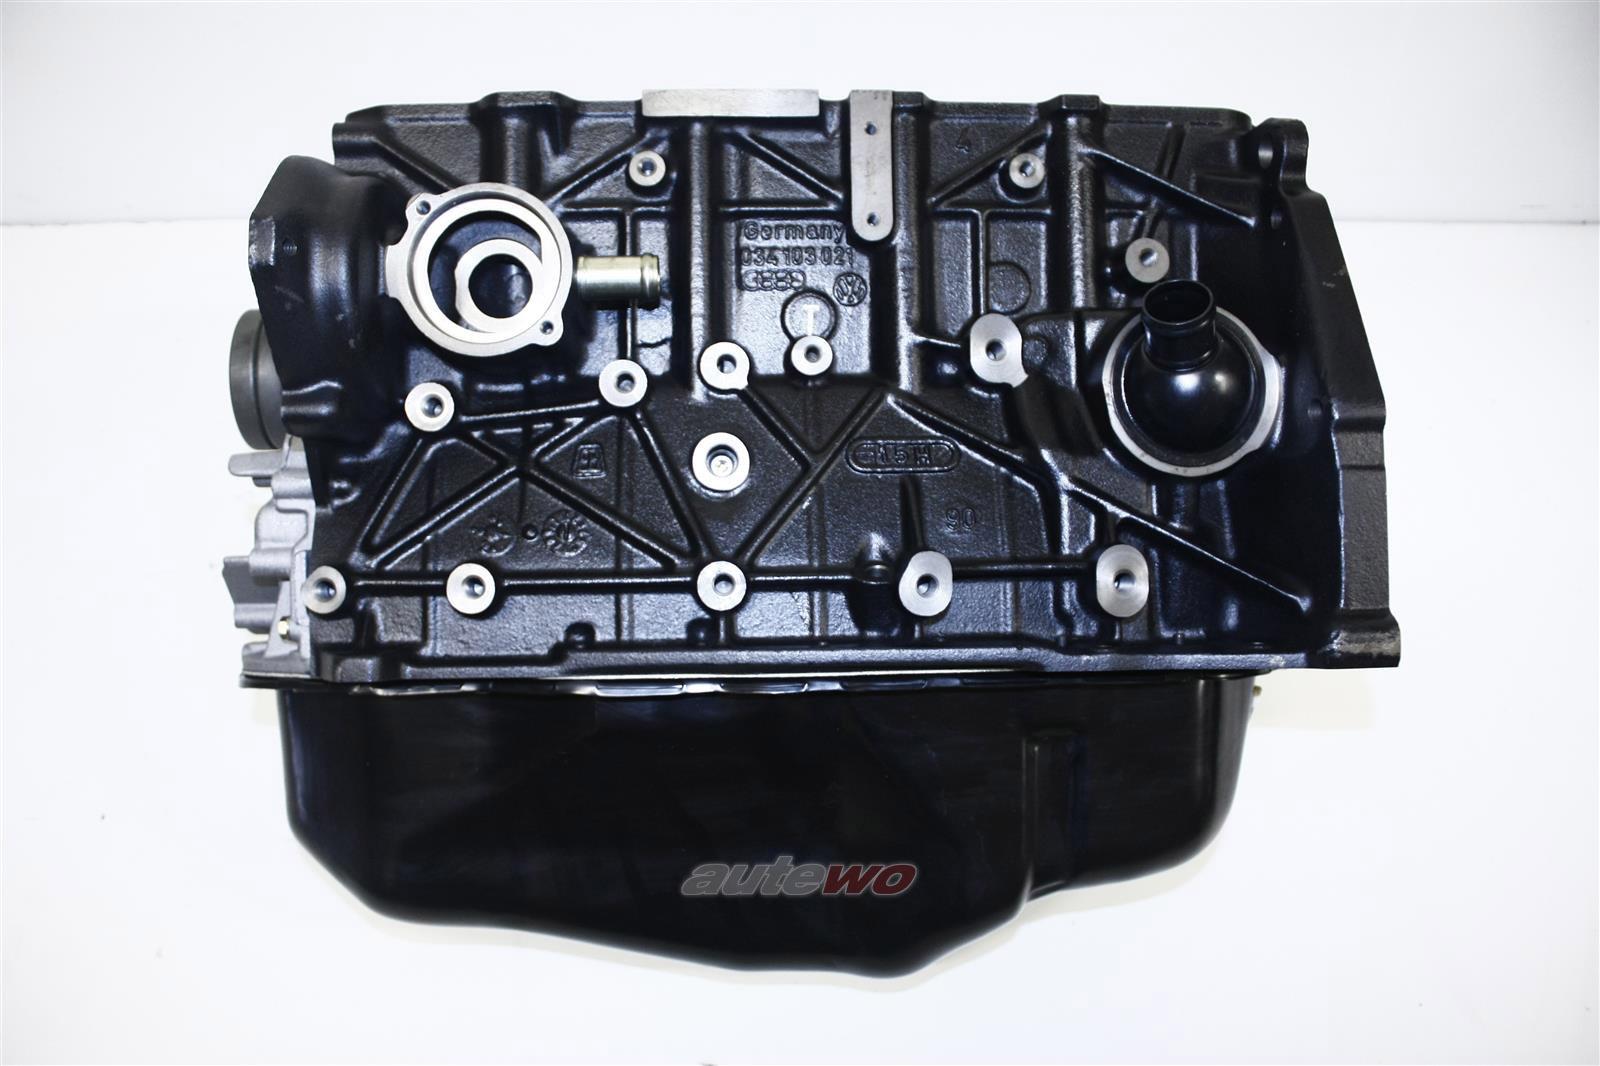 NEU! Audi 90 Typ 81/85/100 Typ 44 2.0l 5 Zyl. Austausch-Motorblock 034100104DX